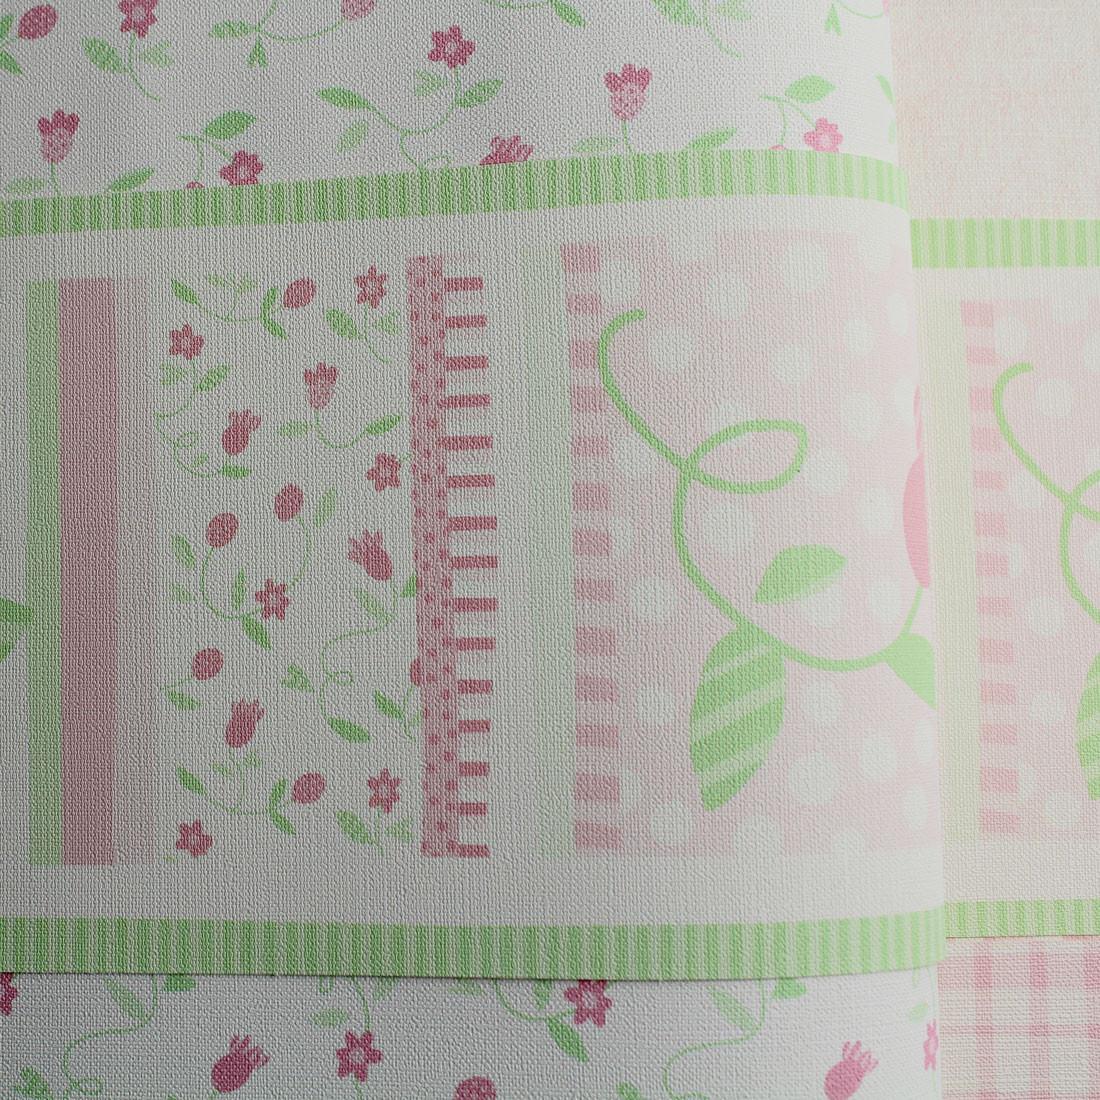 Faixa Decorativa Infantil Floral Delicado - Nido